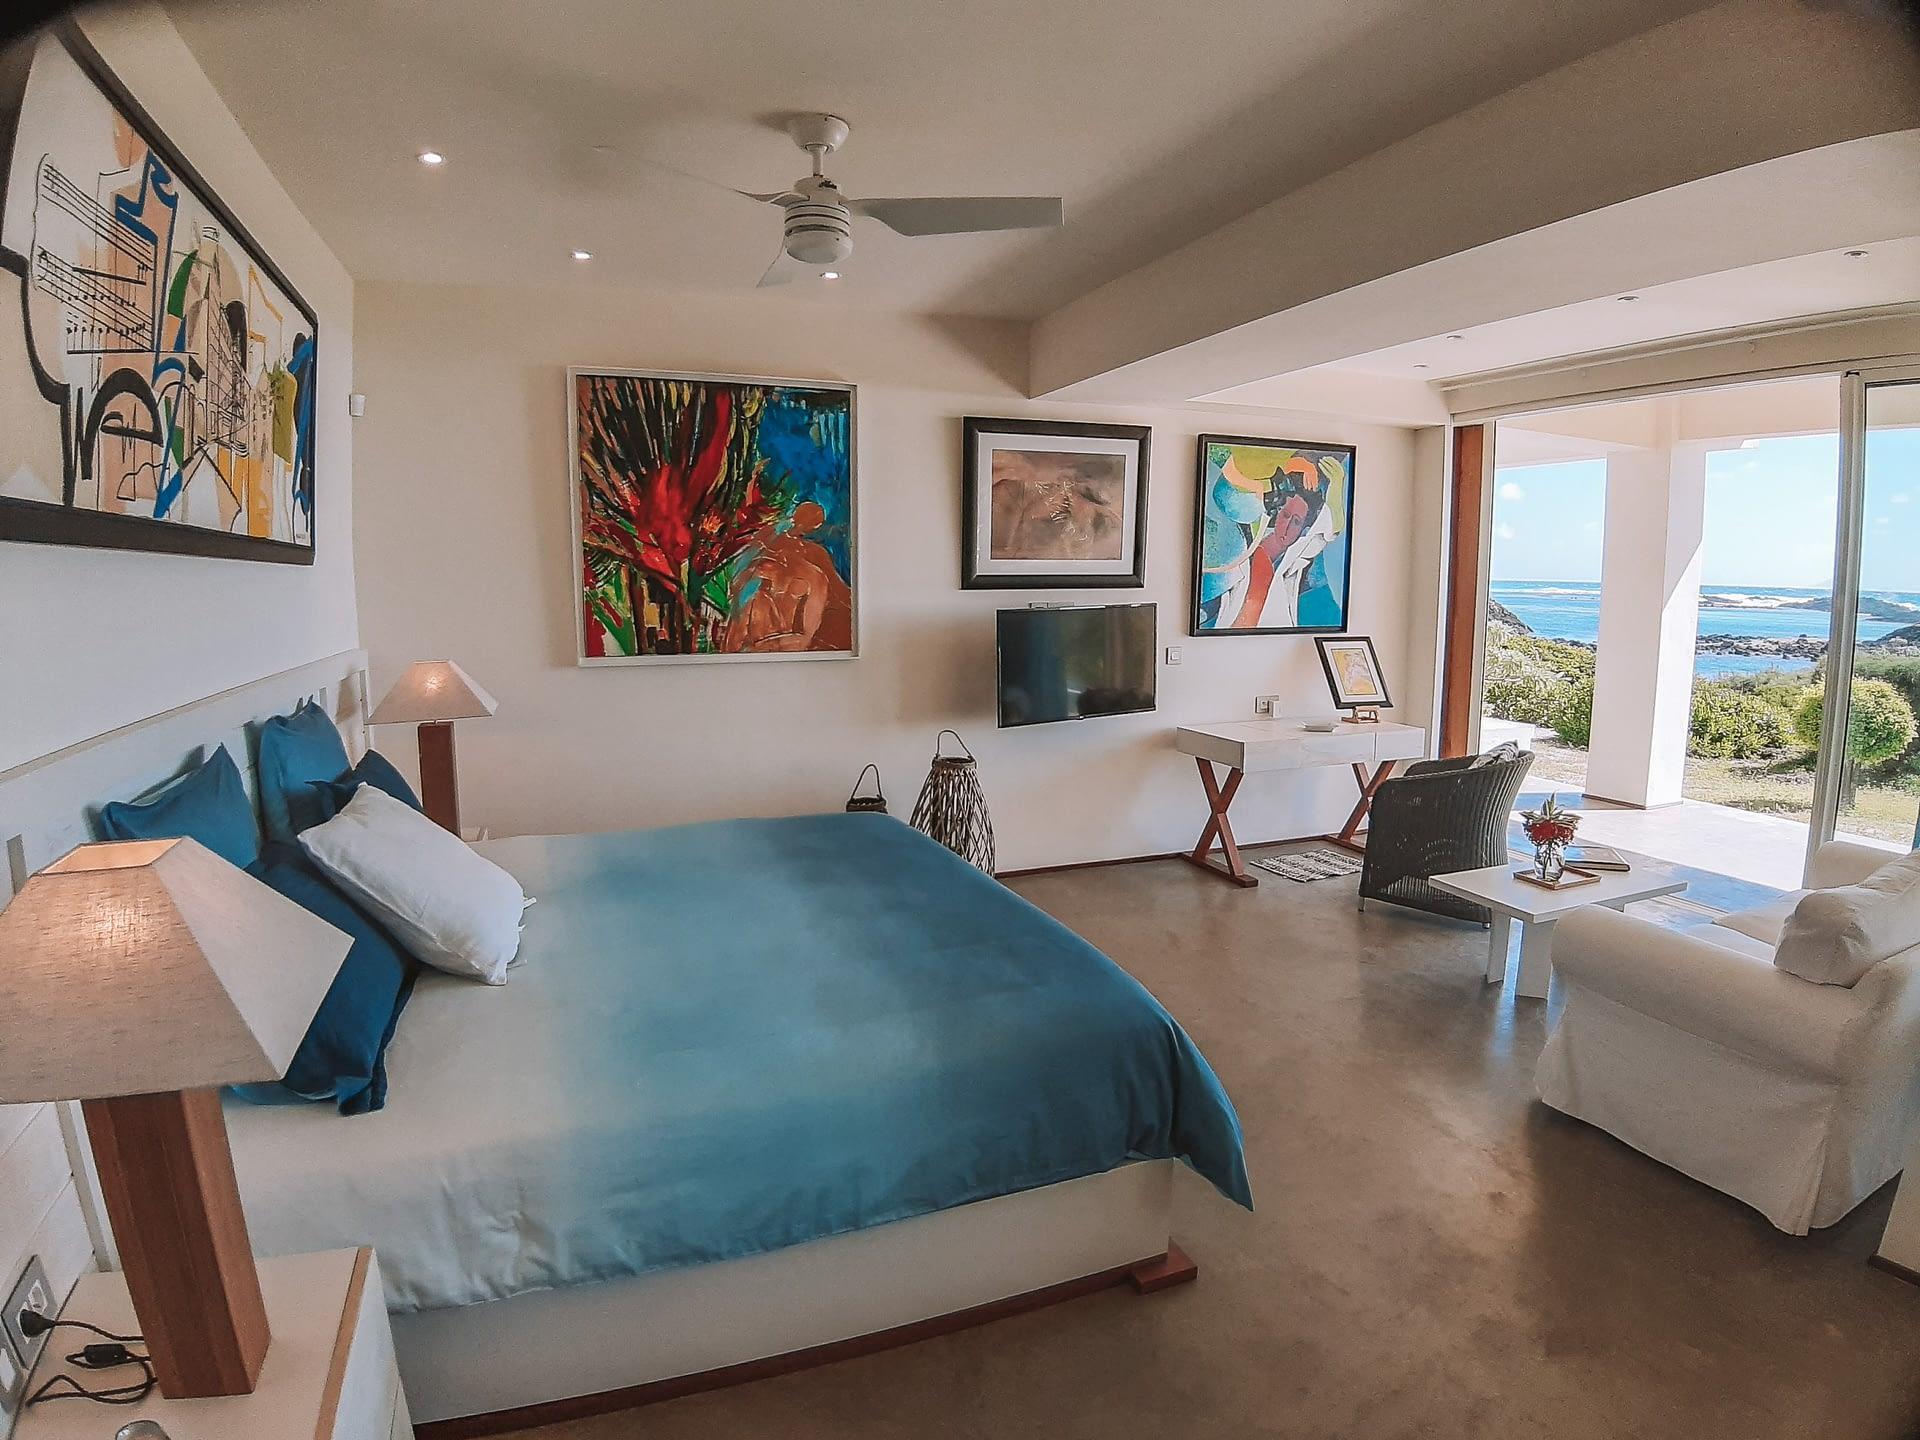 Villa Brisas beachfront master bedroom groundfloor